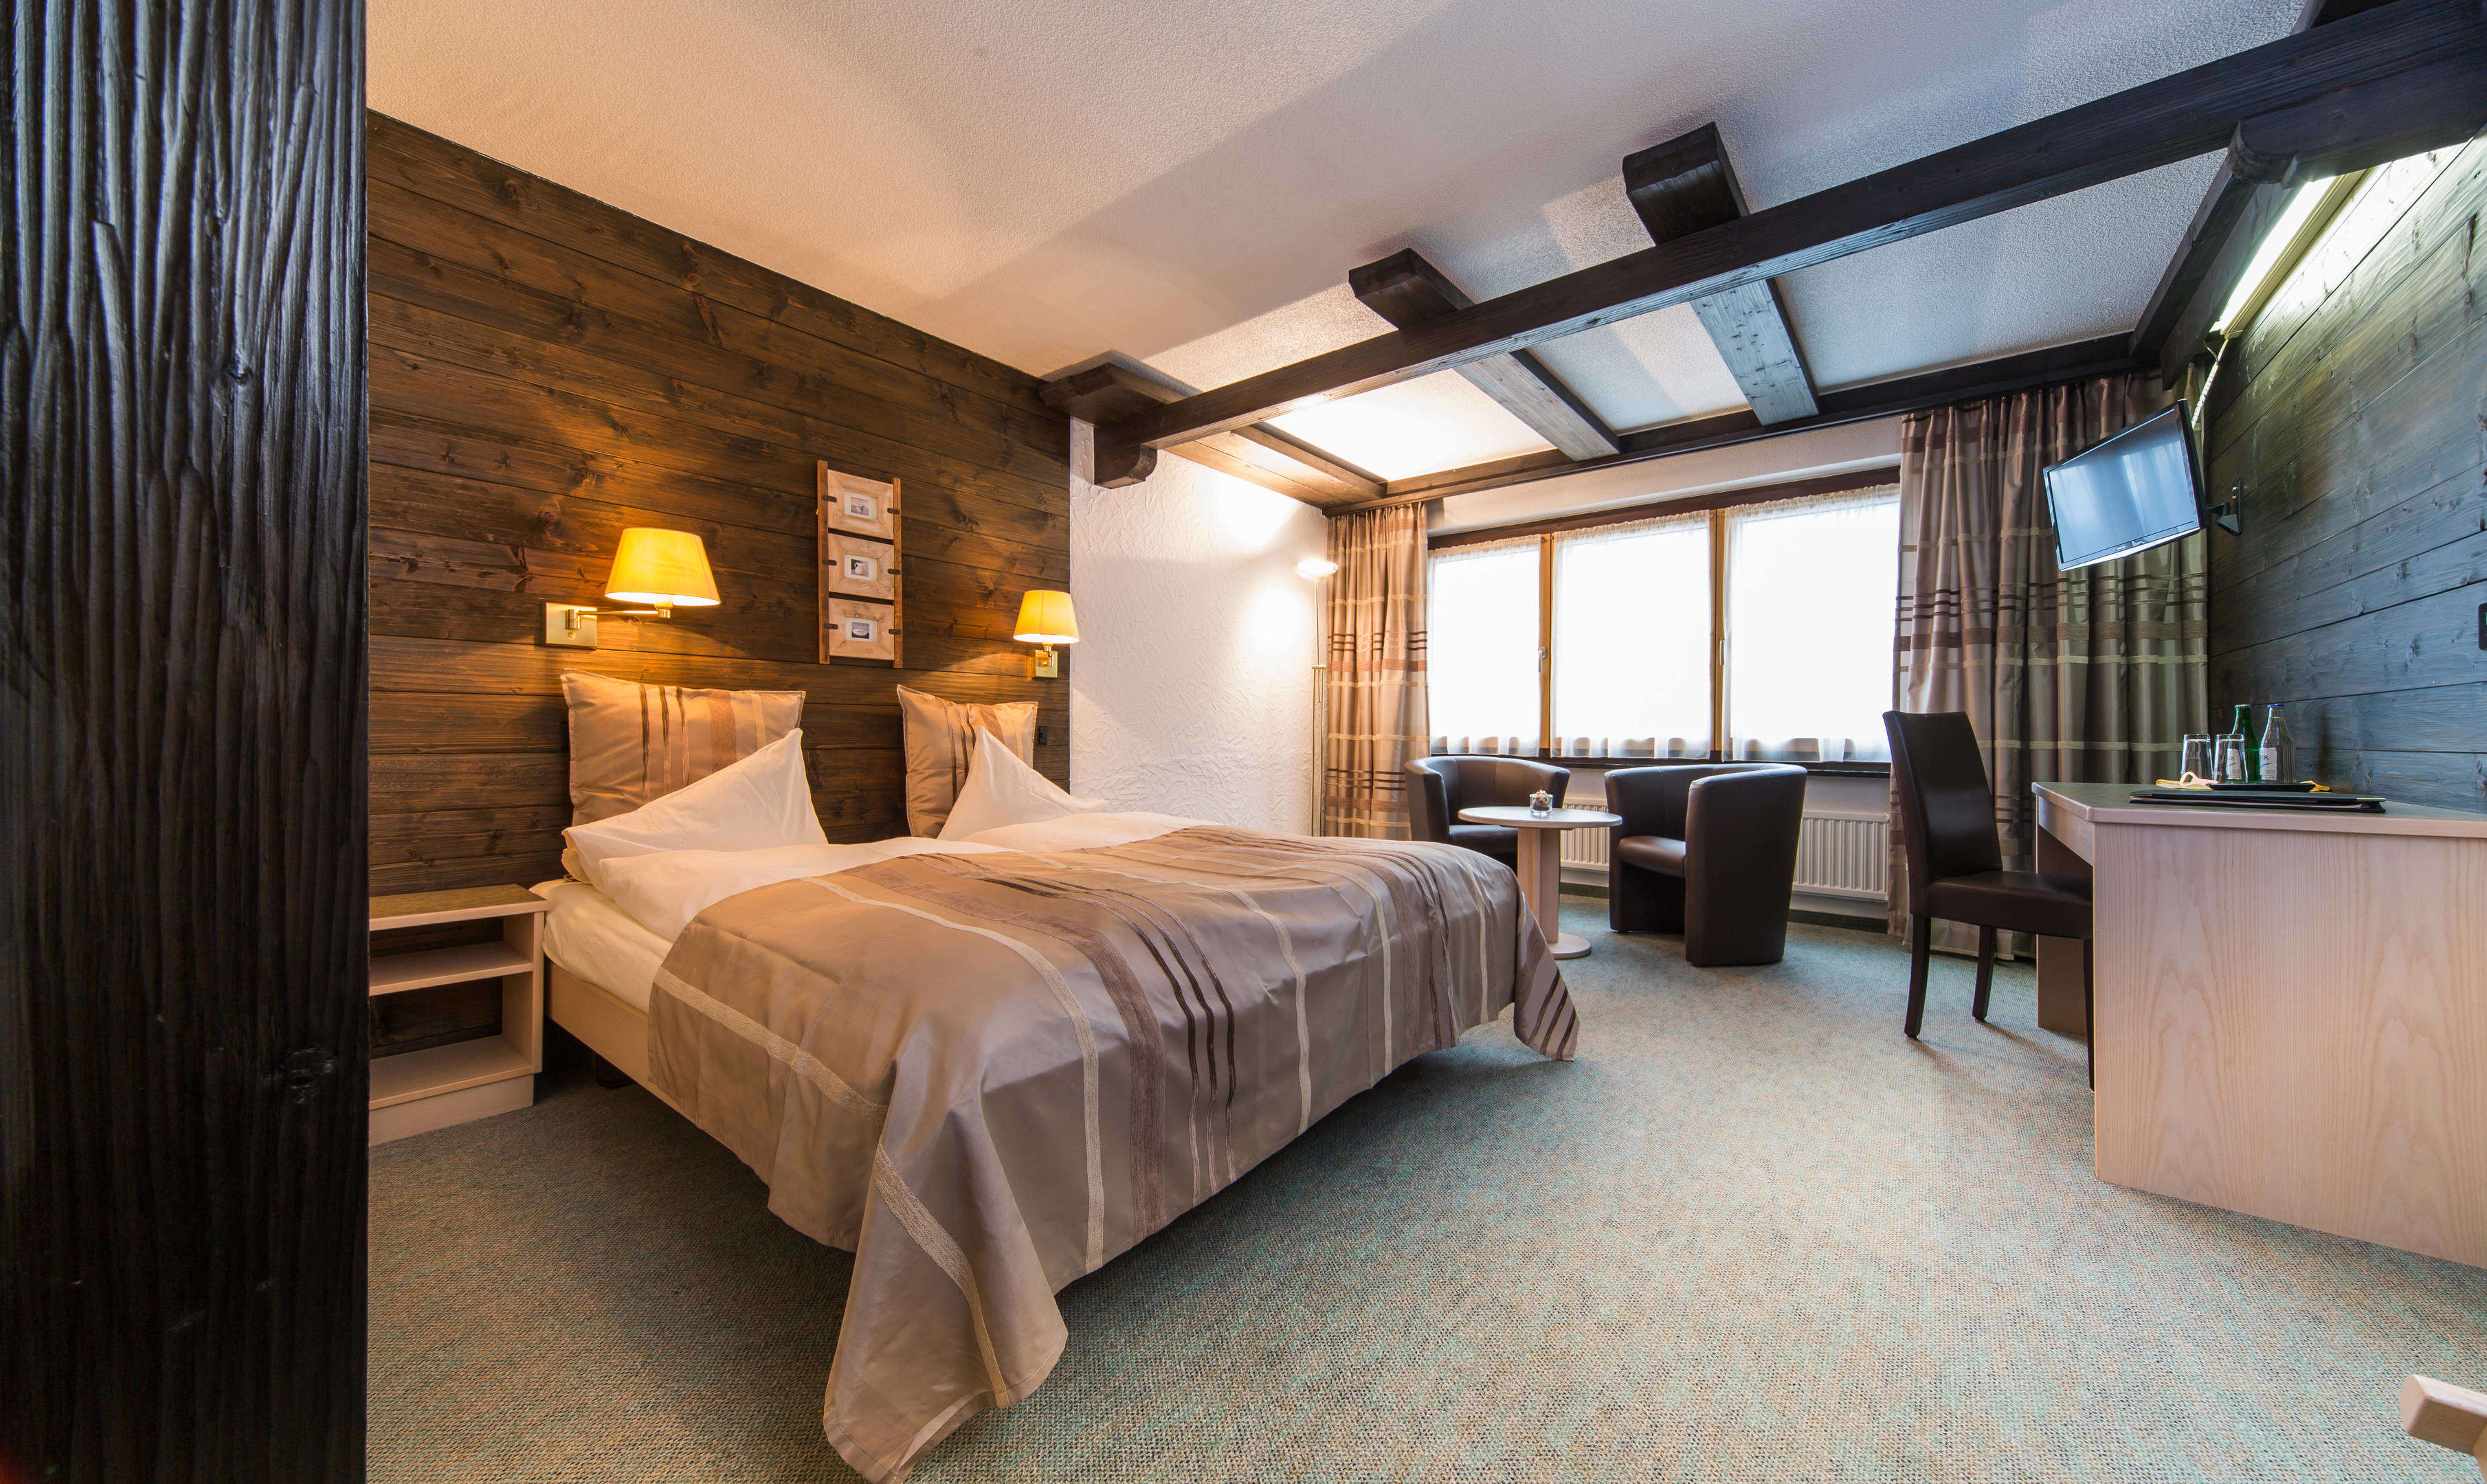 Hotel Relais Bayard in Susten